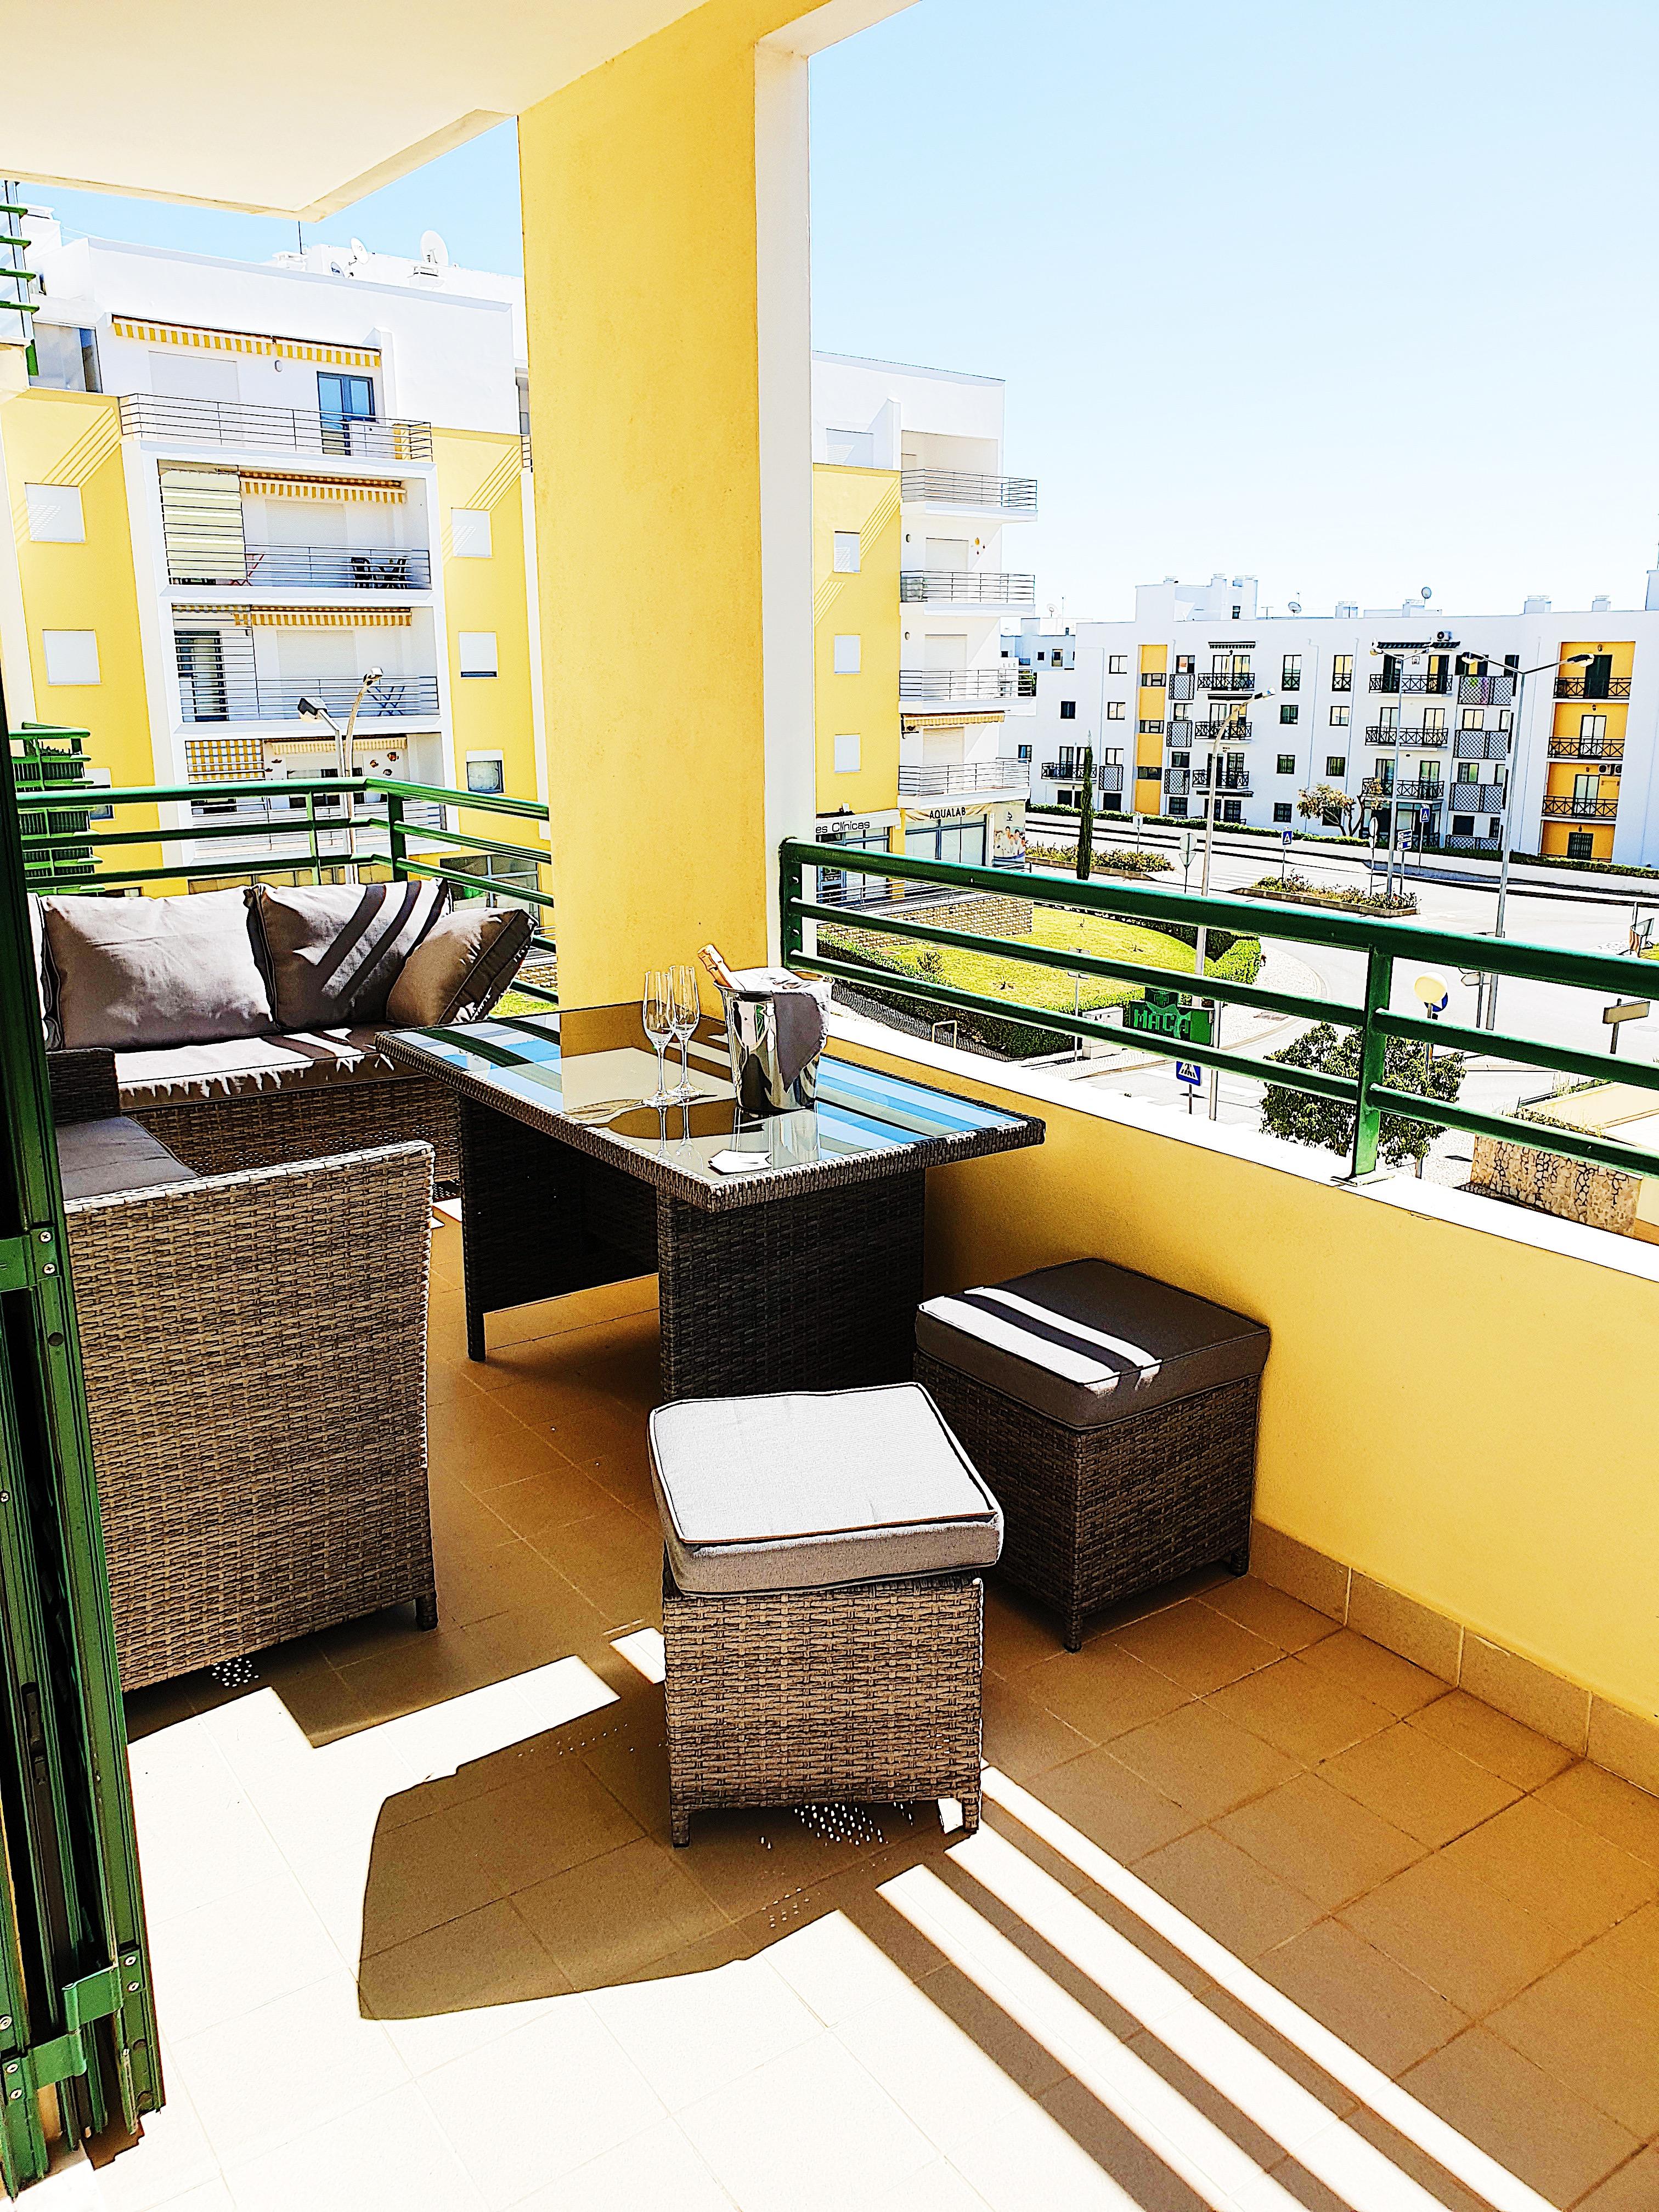 Location appartements et villas de vacance, Arrendamento para Férias – Location de vacance à Armação de Pêra, Portugal Algarve, REF_IMG_8959_8961